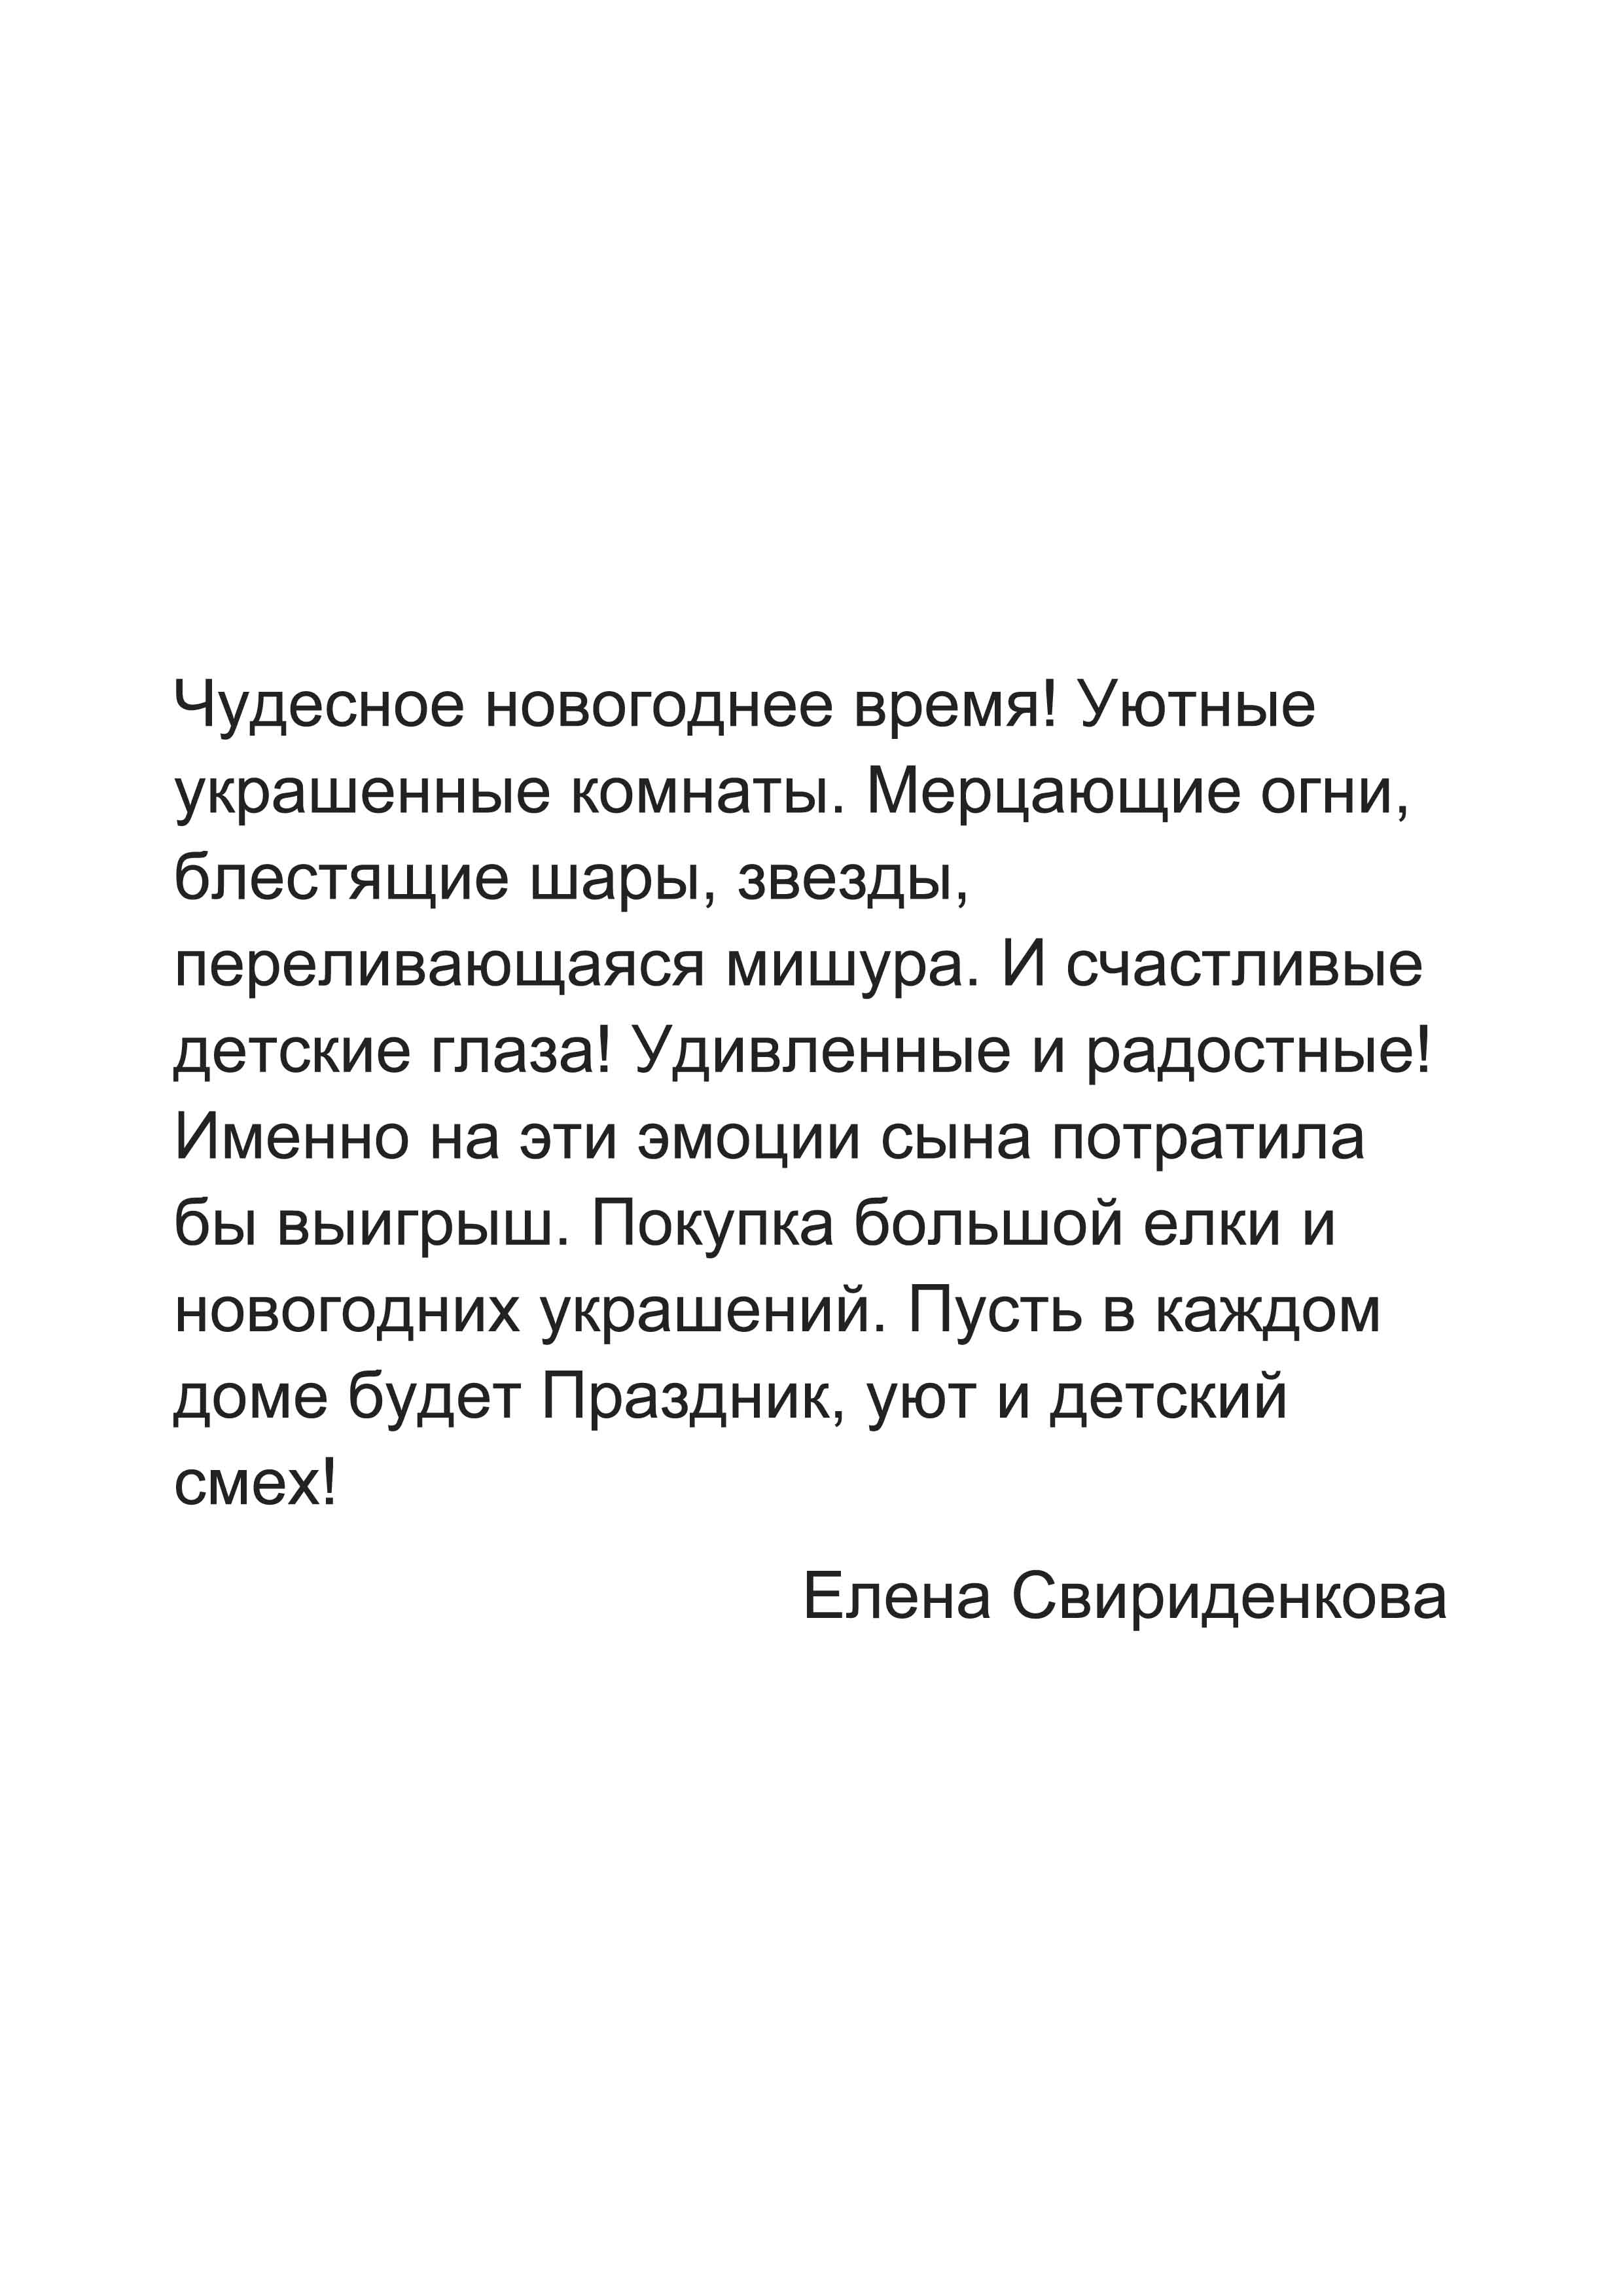 Елена Свириденкова